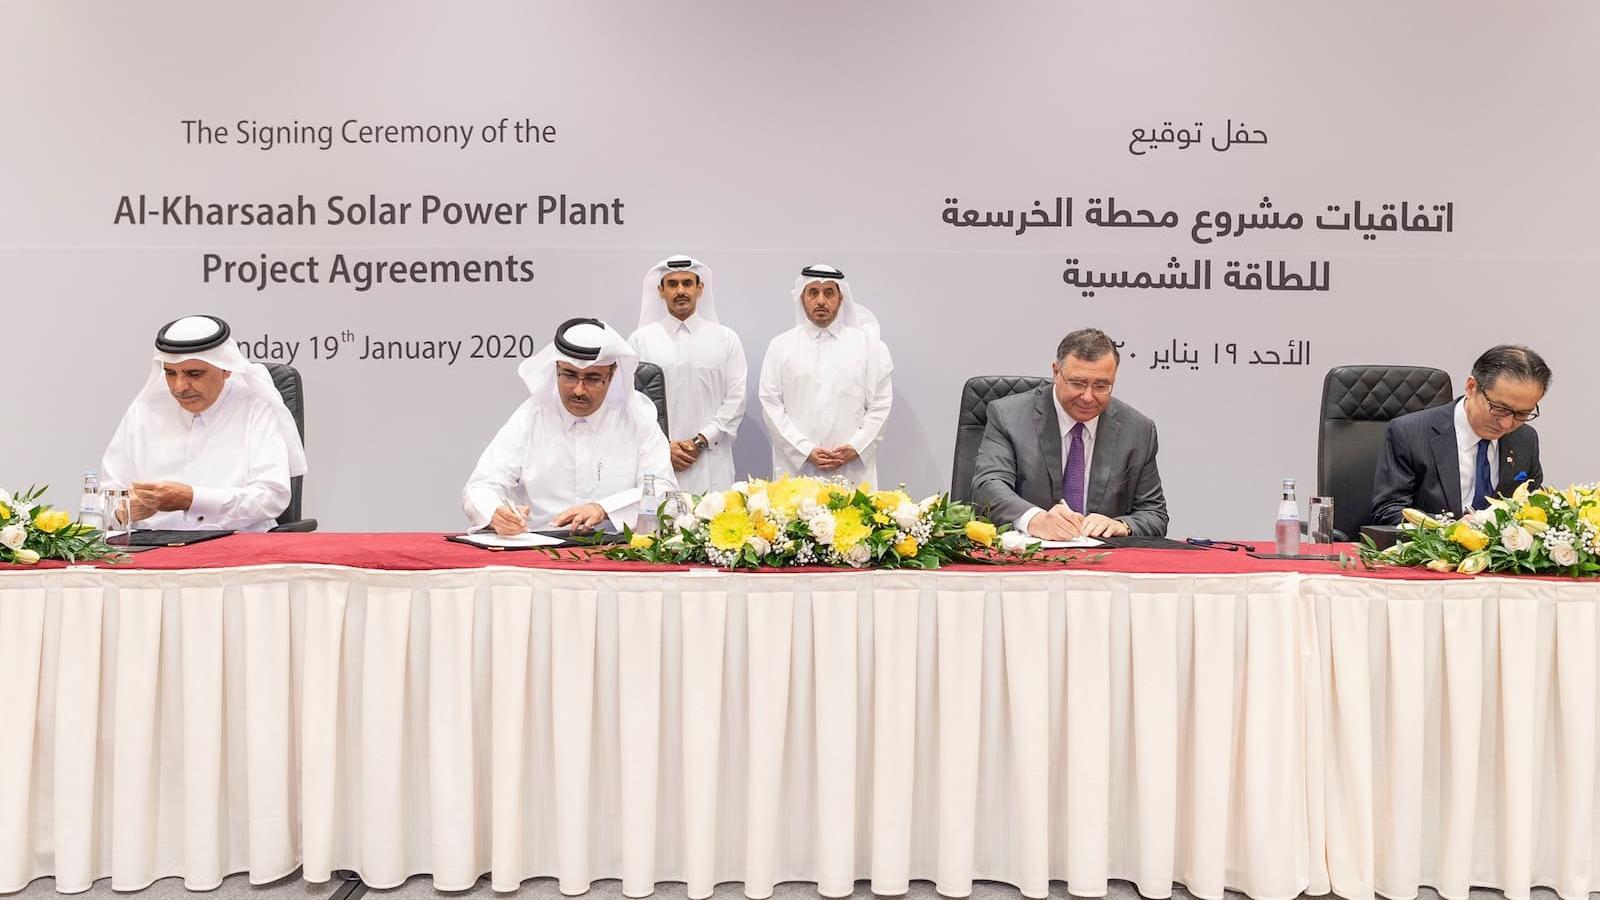 Qatar inks deal to set up QR1.7 billion solar power plant